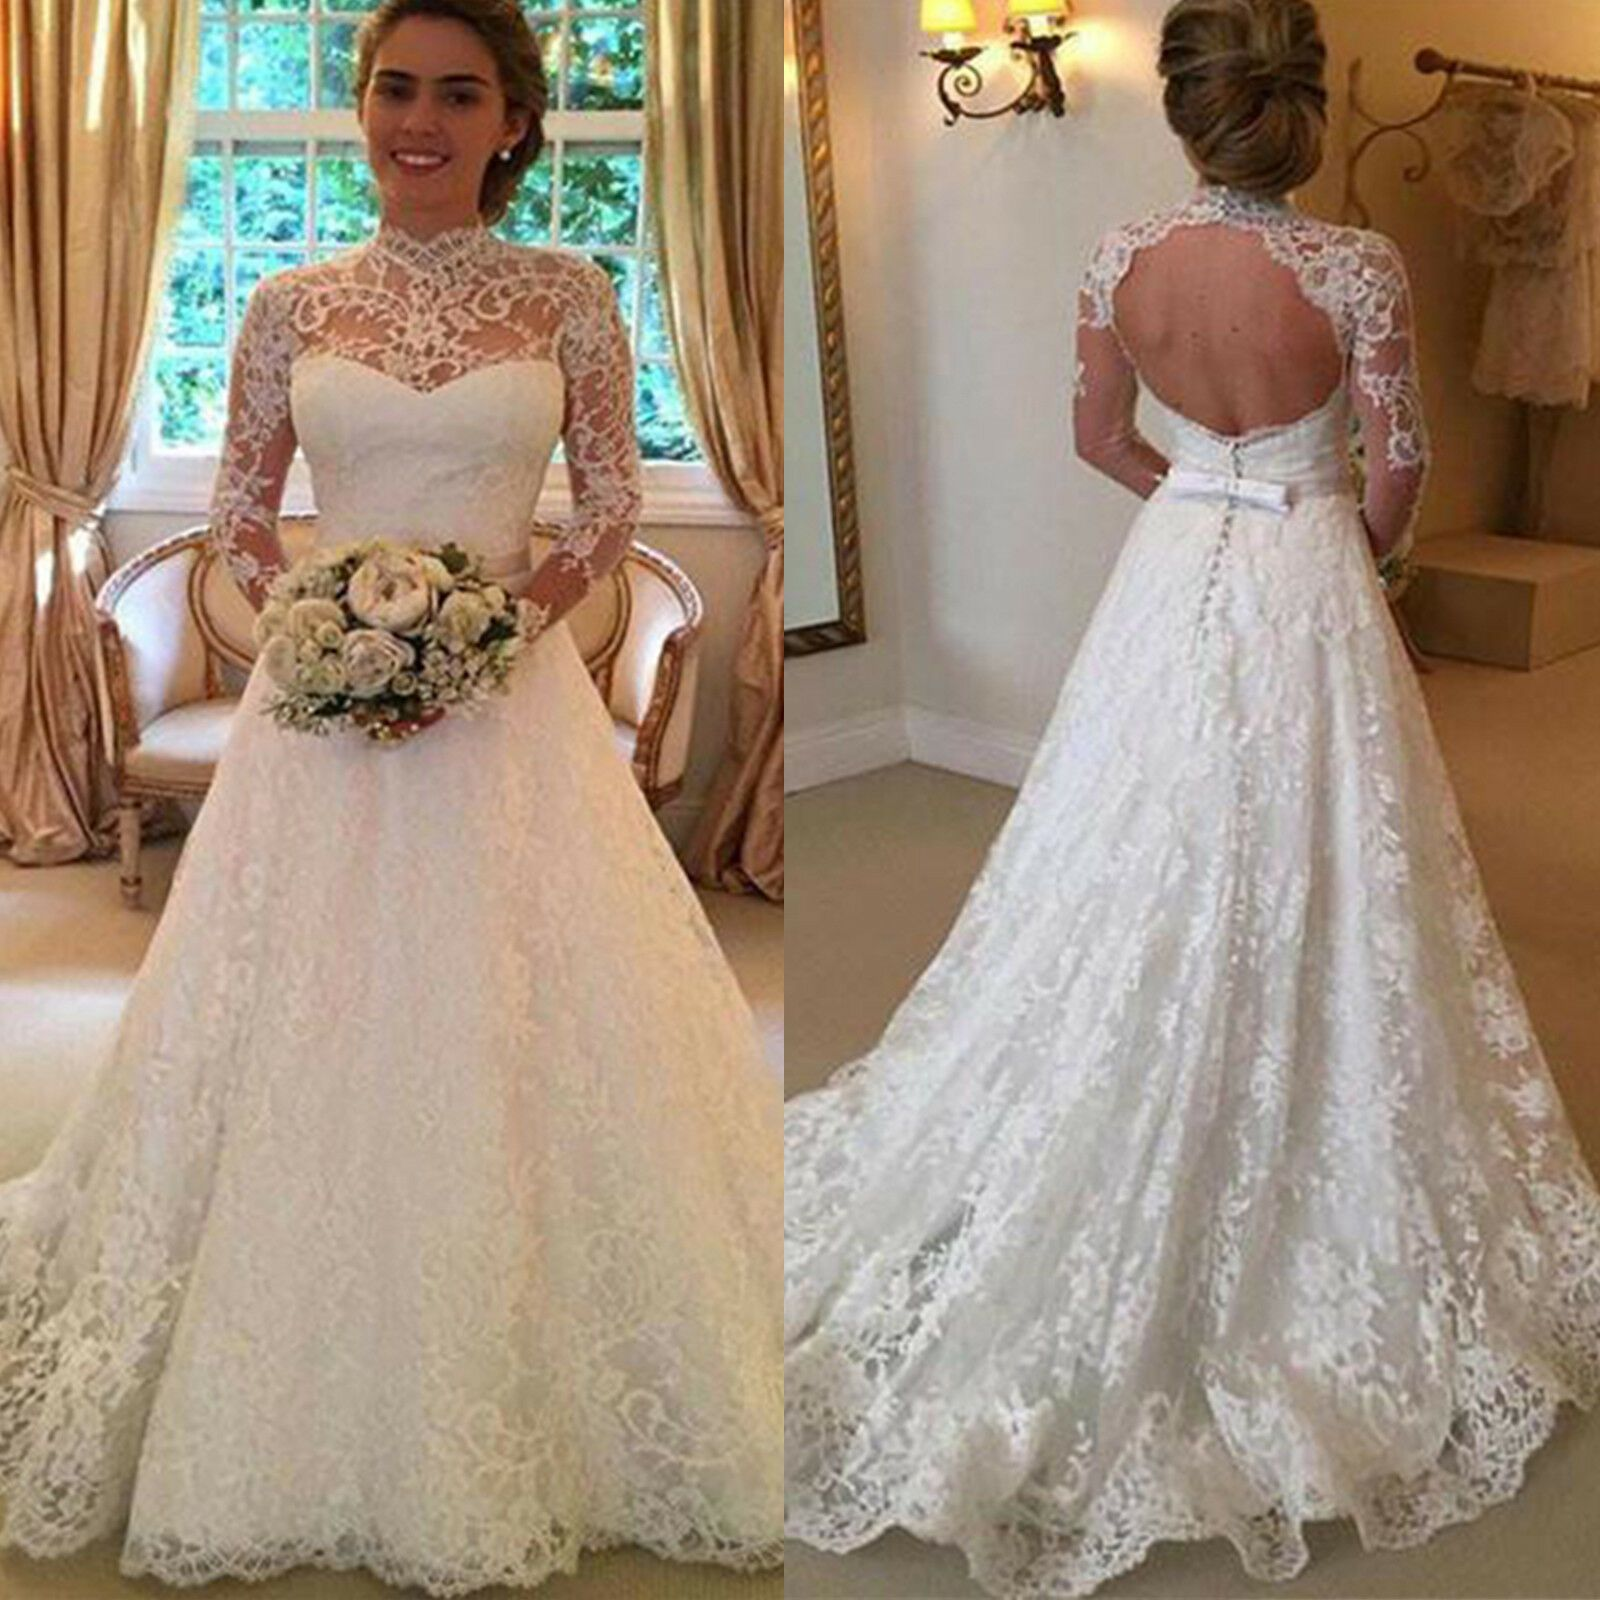 Awesome Amazing Women White Wedding Dresses Full Lace Long Sleeve Dress Backless Bridal Gowns Hochzeitskleider Spitze Hochzeitskleid Spitze Ballkleid Hochzeit [ 1600 x 1600 Pixel ]